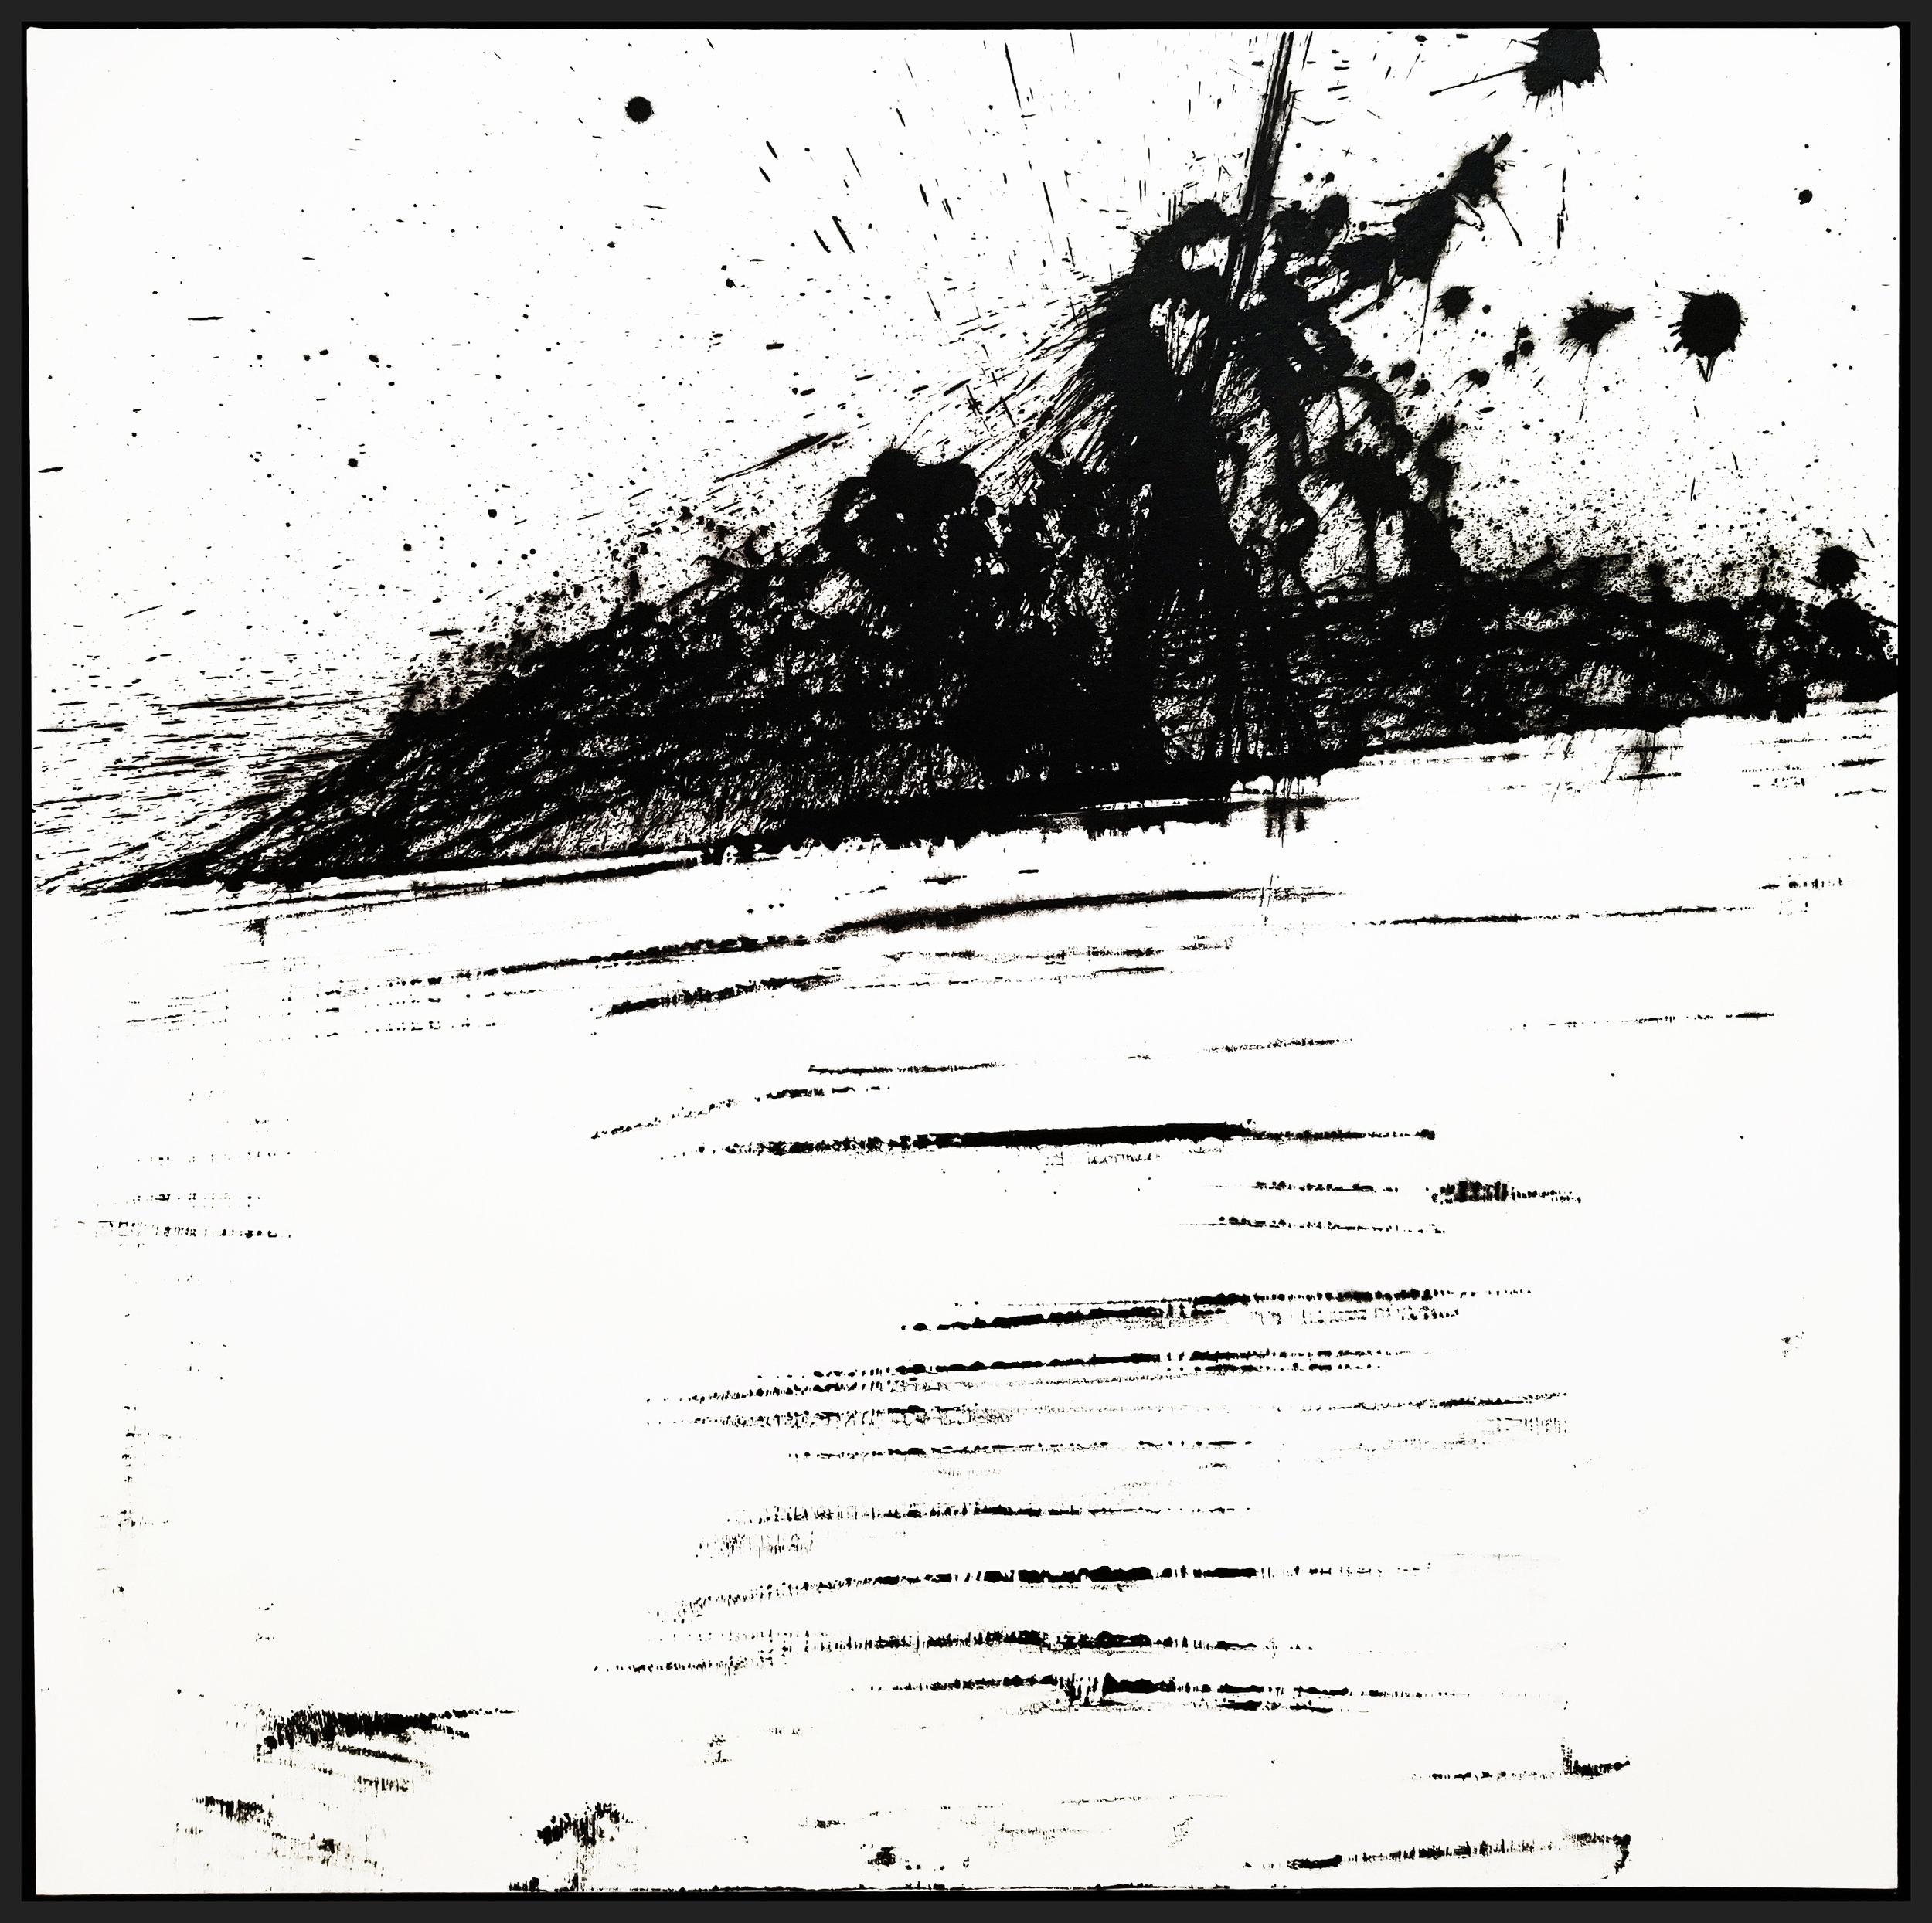 "Black & White #11, 2018, acrylic on canvas, 48"" x 48"" (122 x 122 cm)"